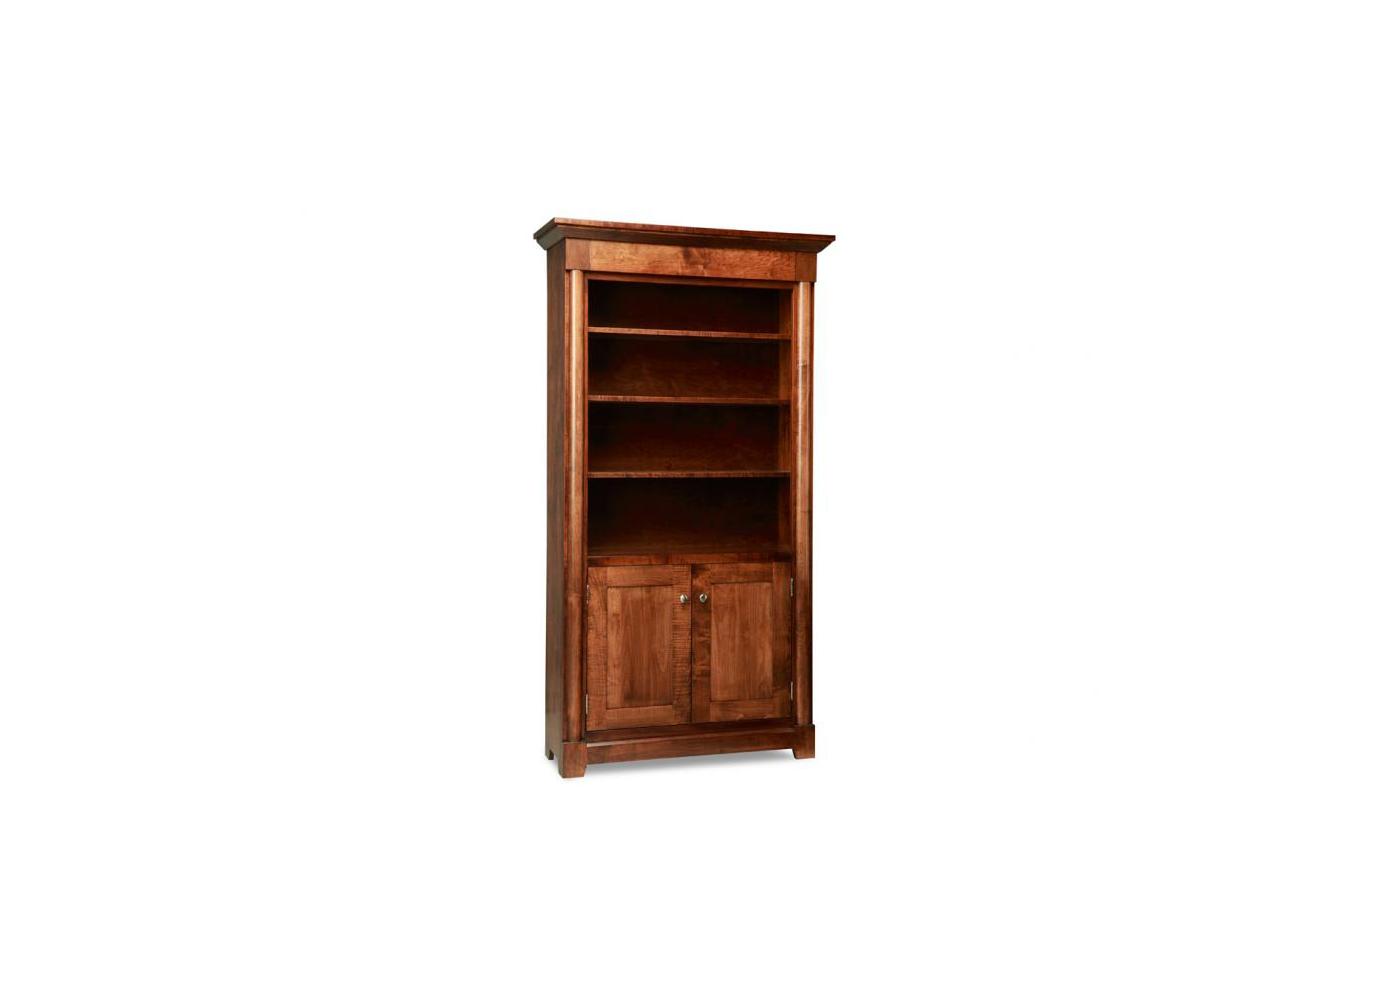 polanco furniture store ottawa interior decor solutions 4 fab decor stores in ottawa style at home